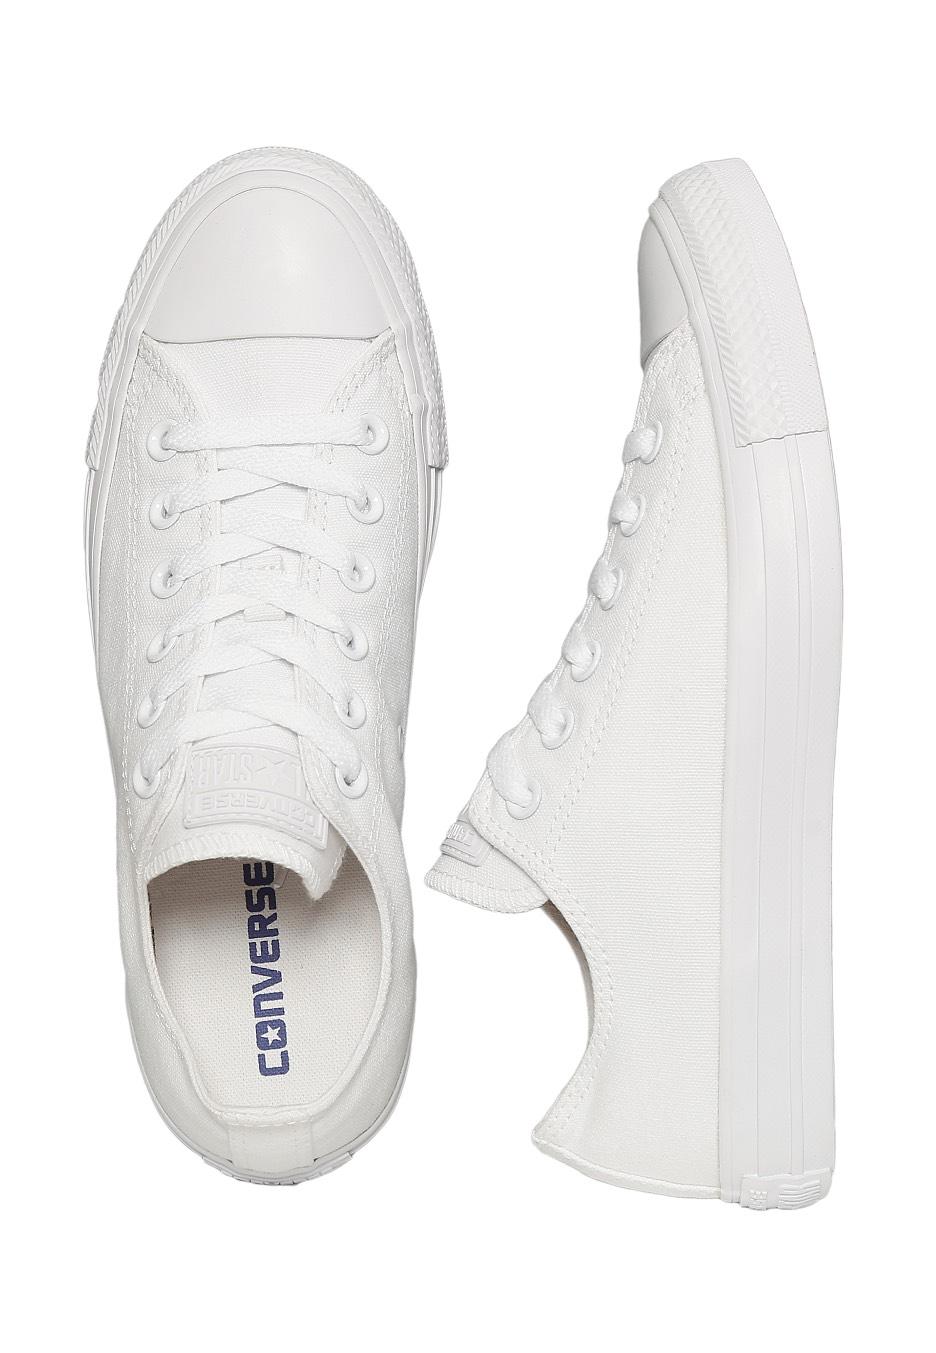 2converse white